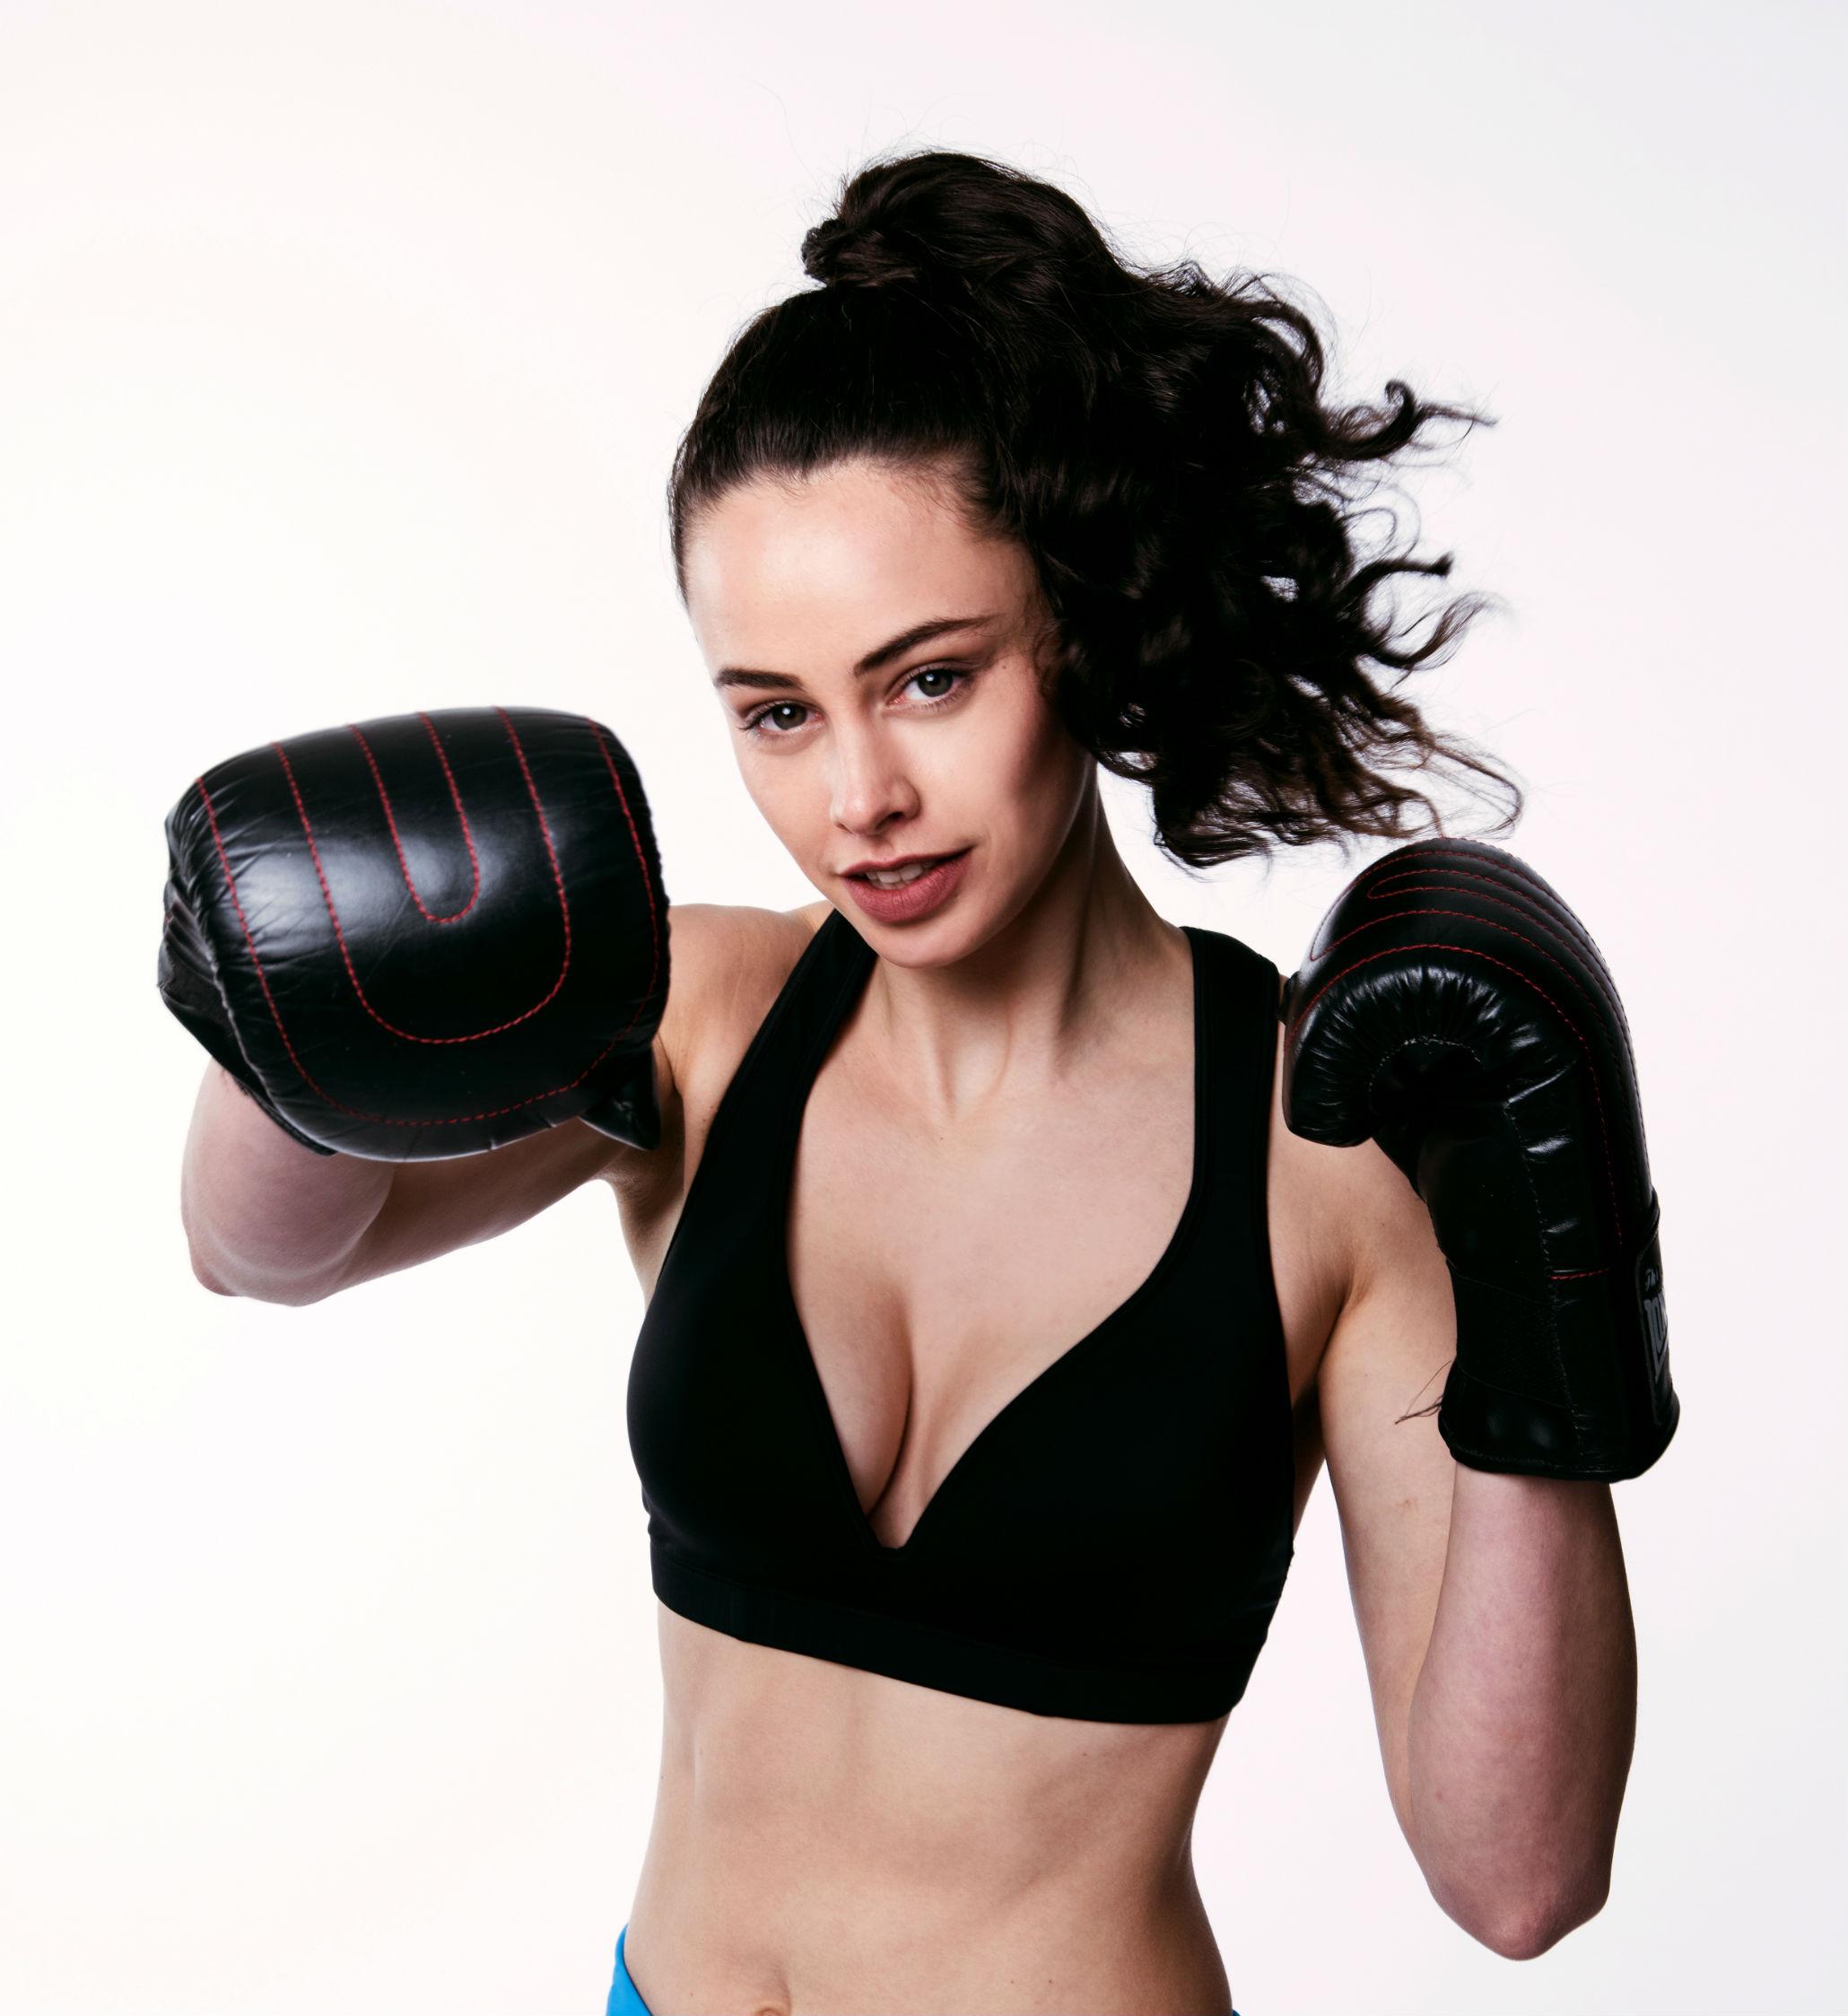 Leilani Black Sports Bra – Women's Gym to Swim Wear from RubyMoon